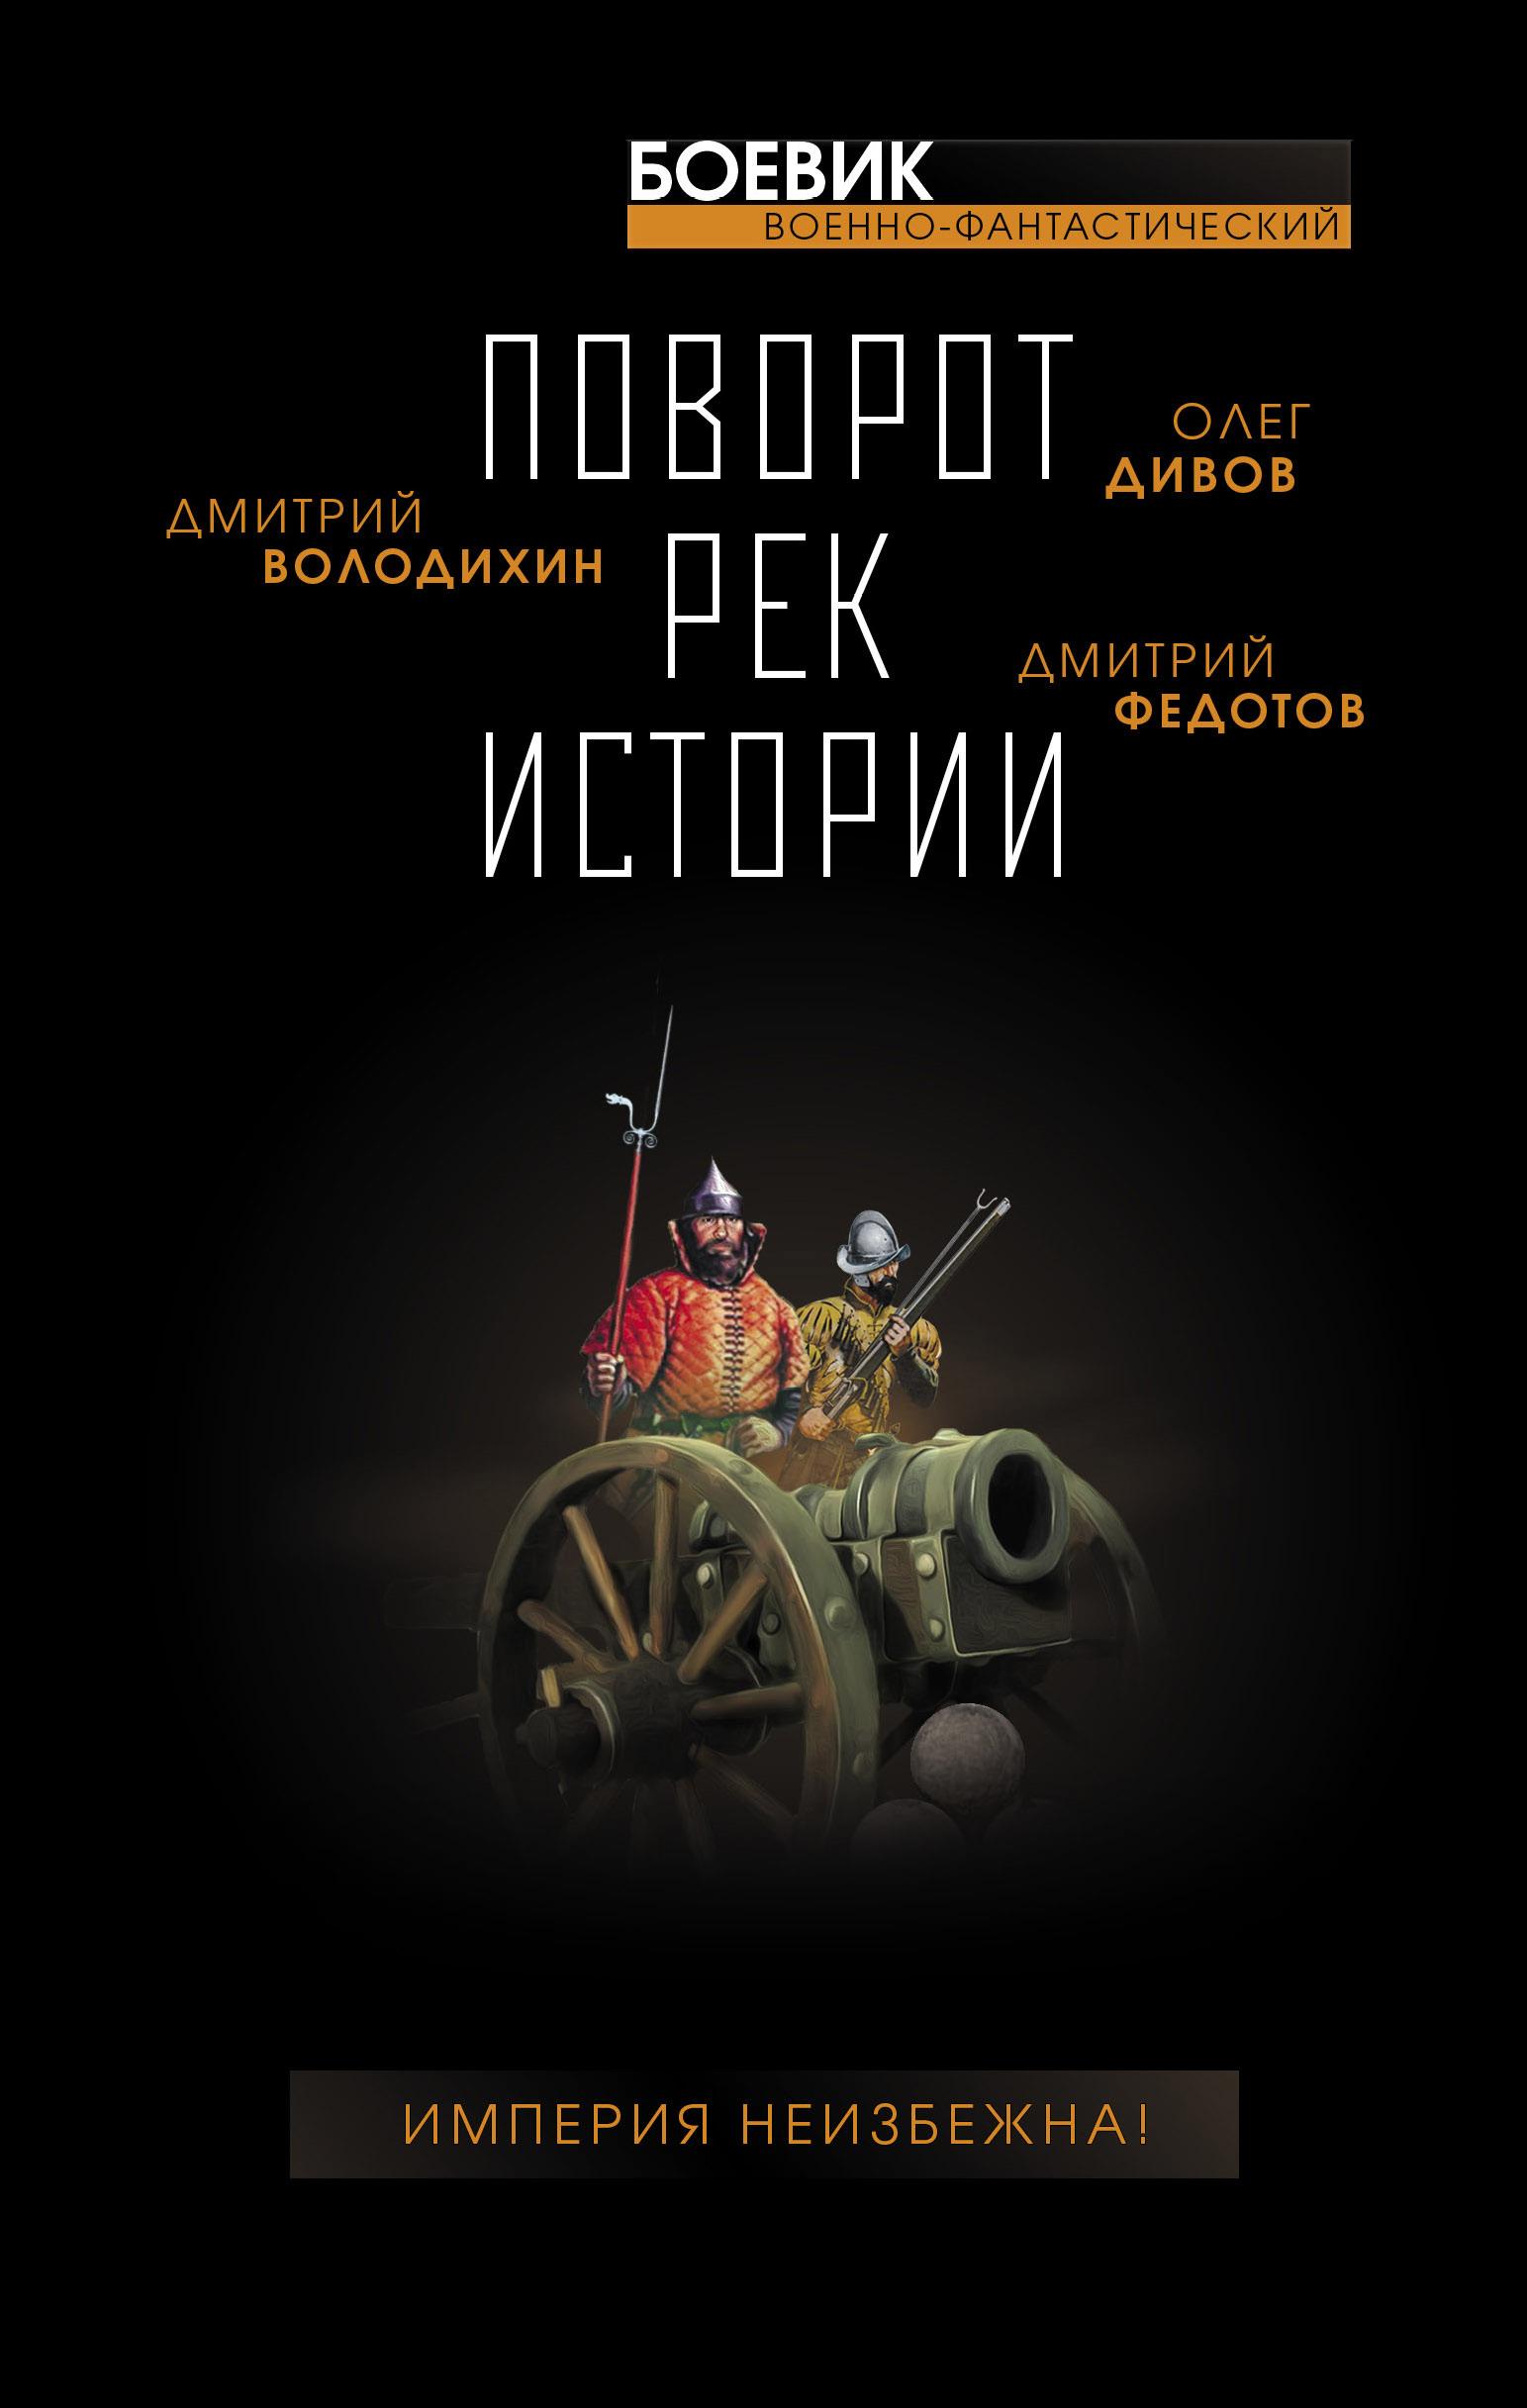 Купить книгу Поворот рек истории, автора Олега Дивова